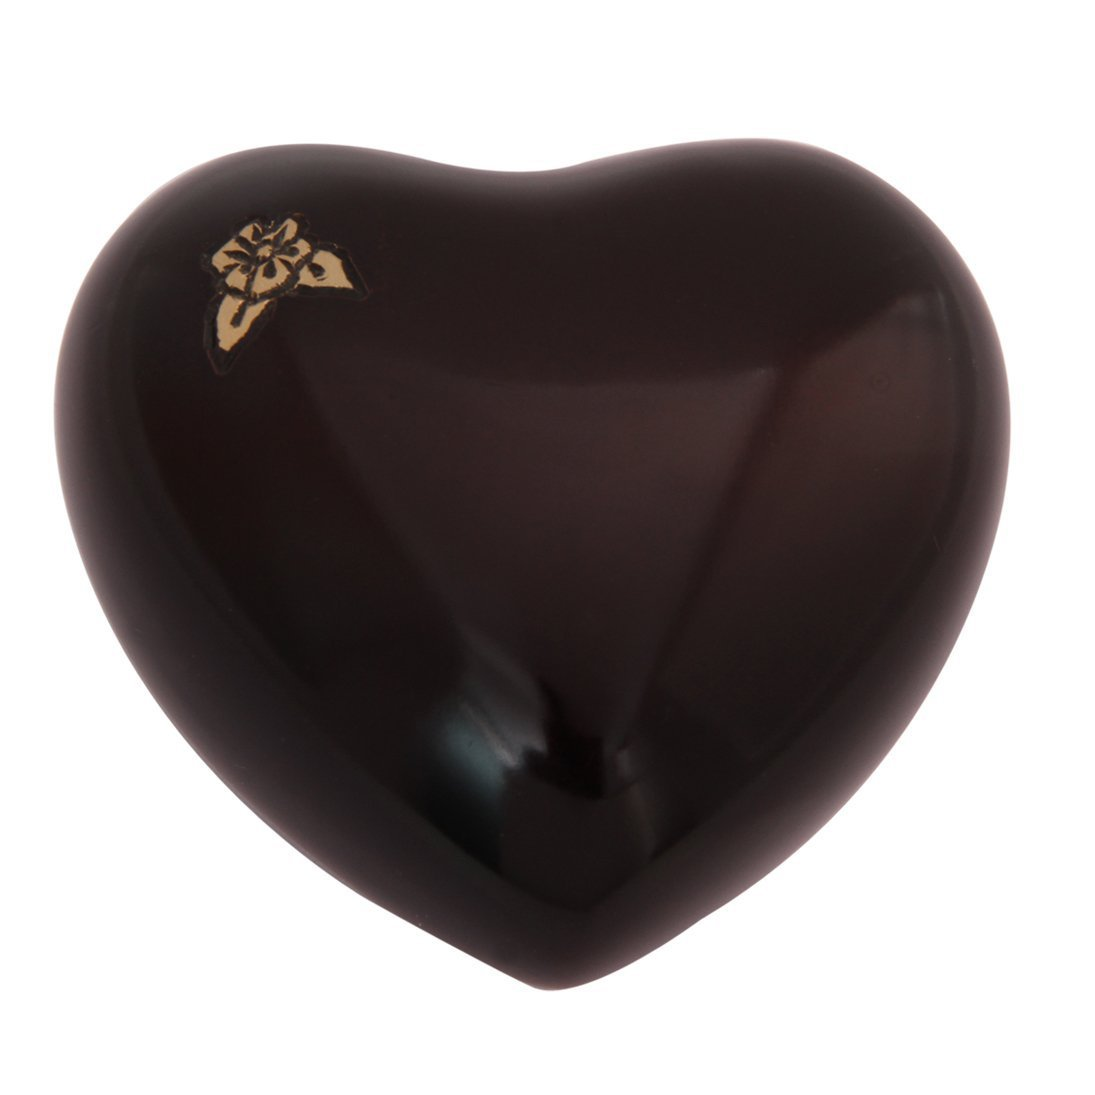 Maroon Artisan Mini Heart Keepsake Urn, Flower Cremation Urns Ashes